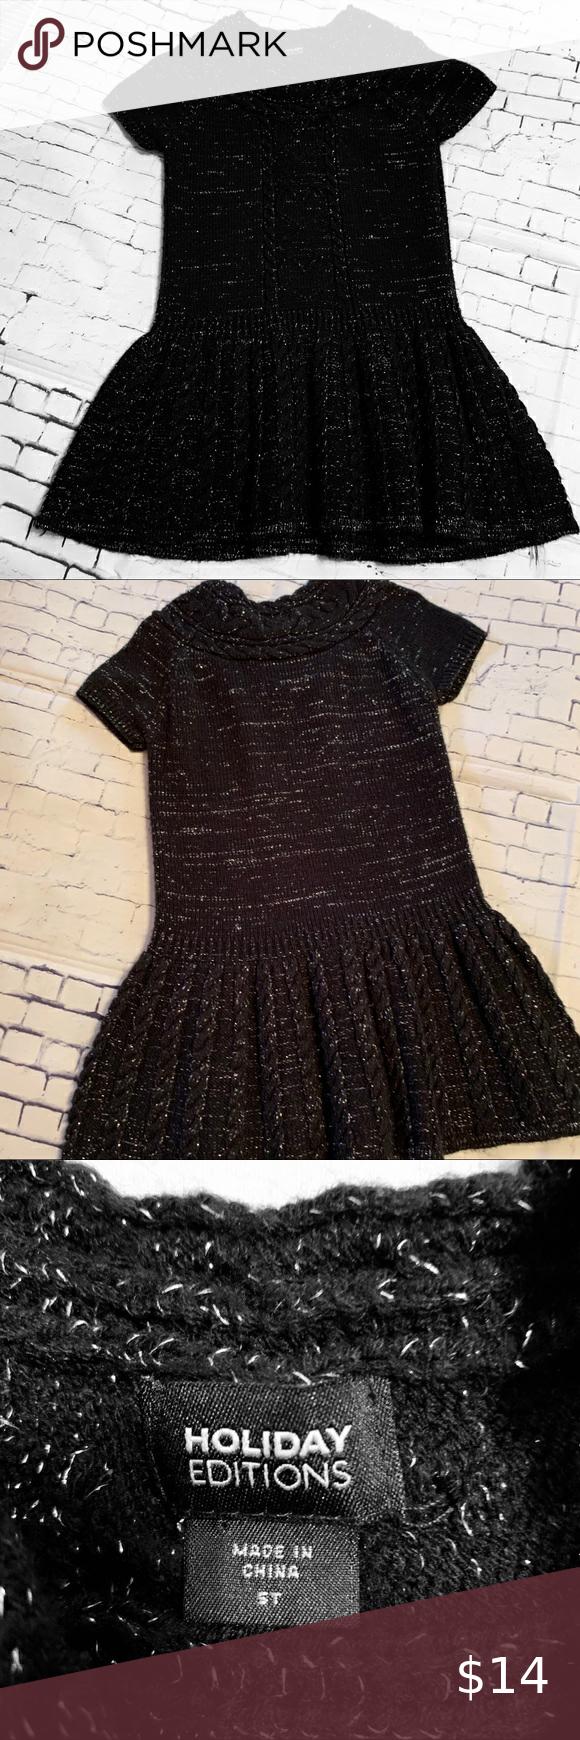 Holiday Editions Sweater Dress Size 5t Dresses Sweater Dress Kids Dresses [ 1740 x 580 Pixel ]